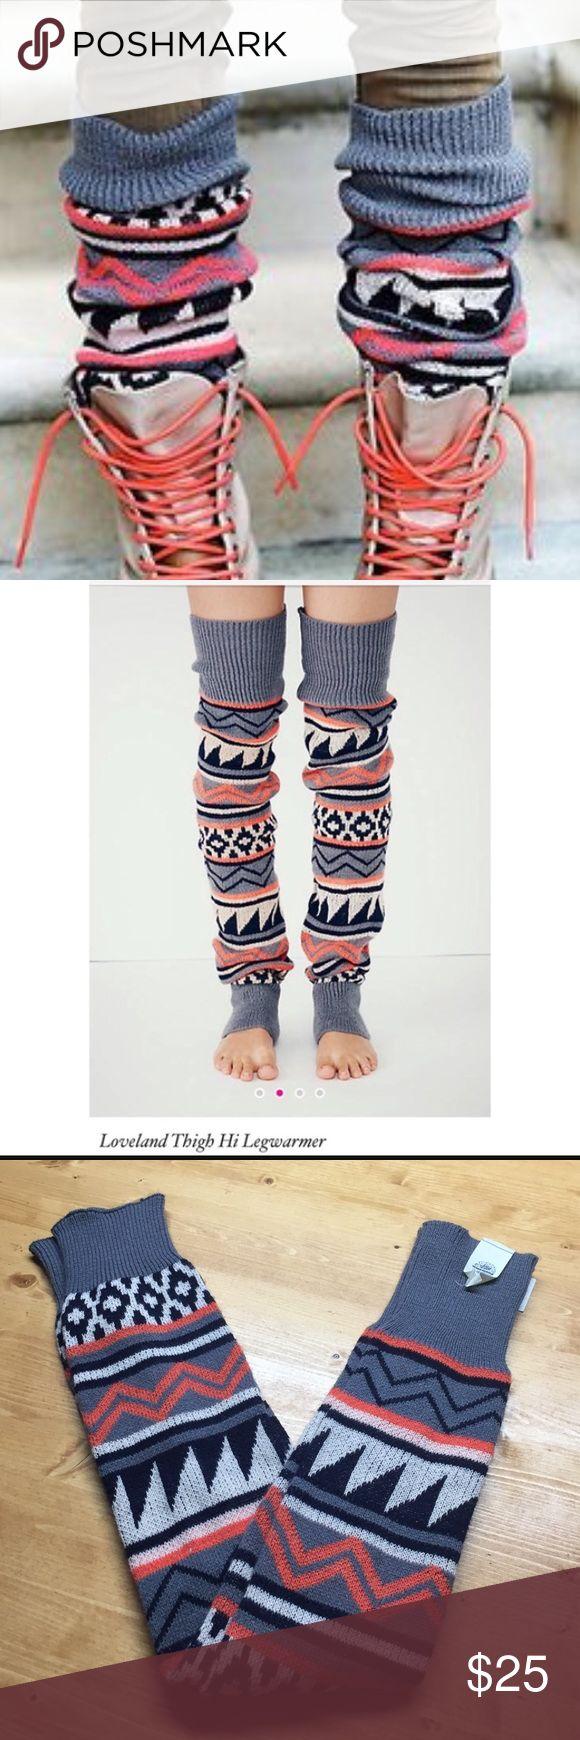 Free People Leg Warmer NEW Free People Loveland Thigh High Leg Warmers! Free People Accessories Hosiery & Socks